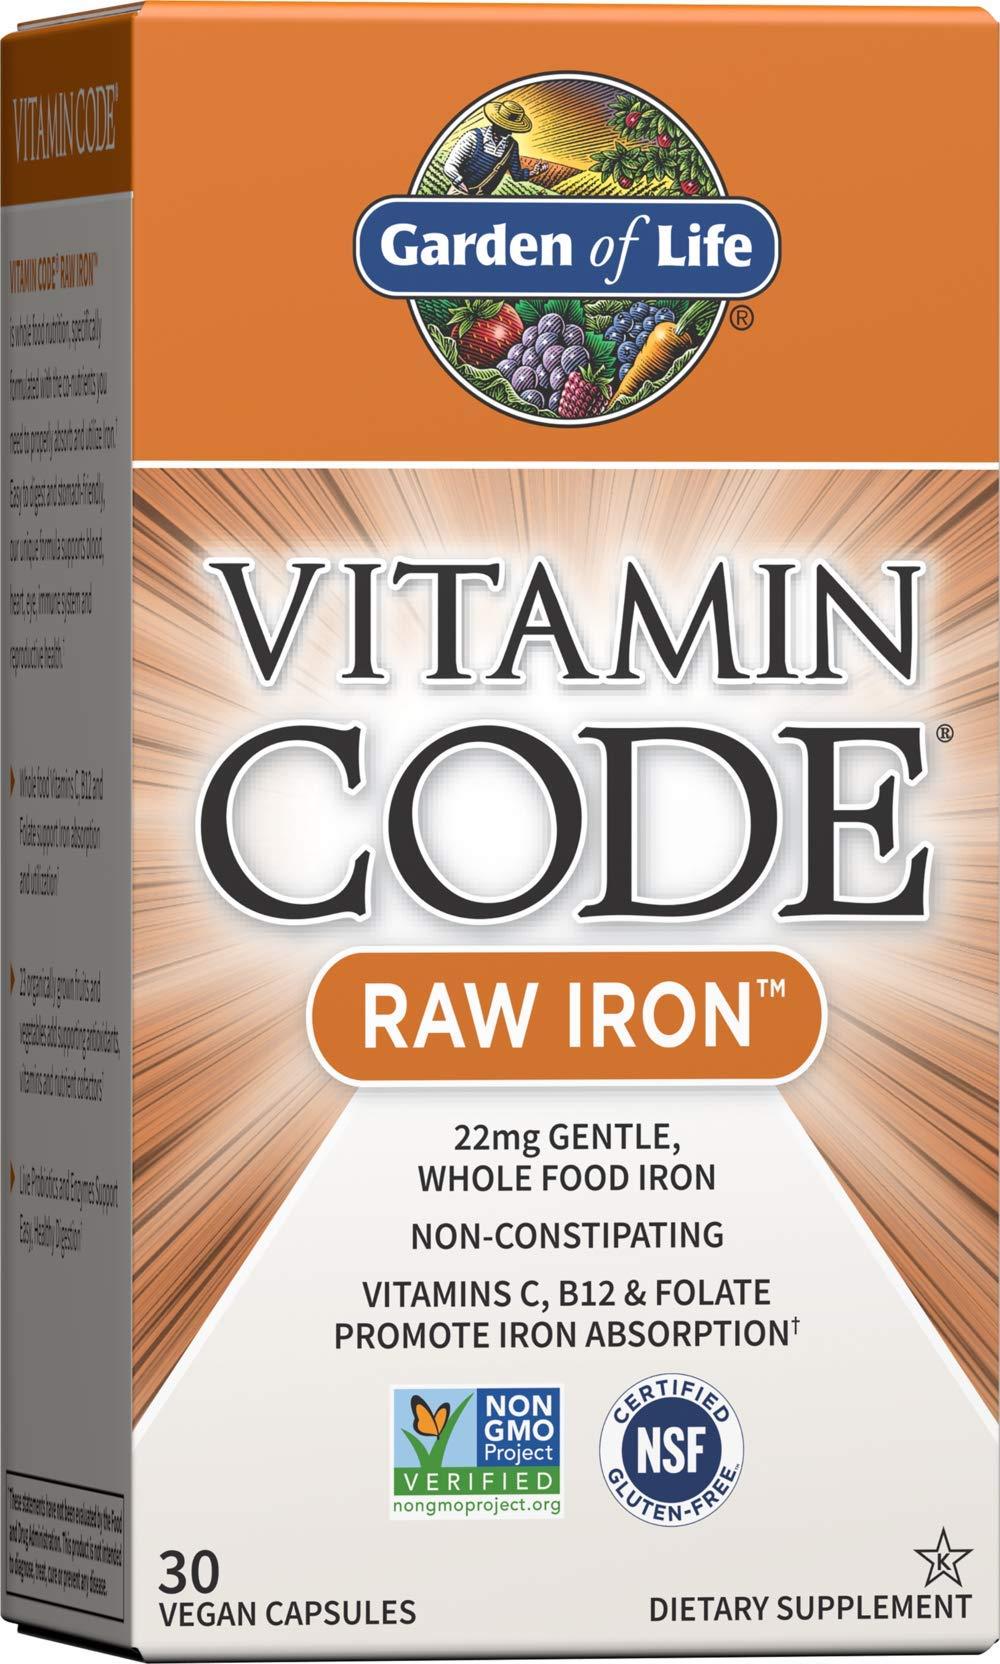 Garden of Life Vitamin Code Raw Iron Supplement